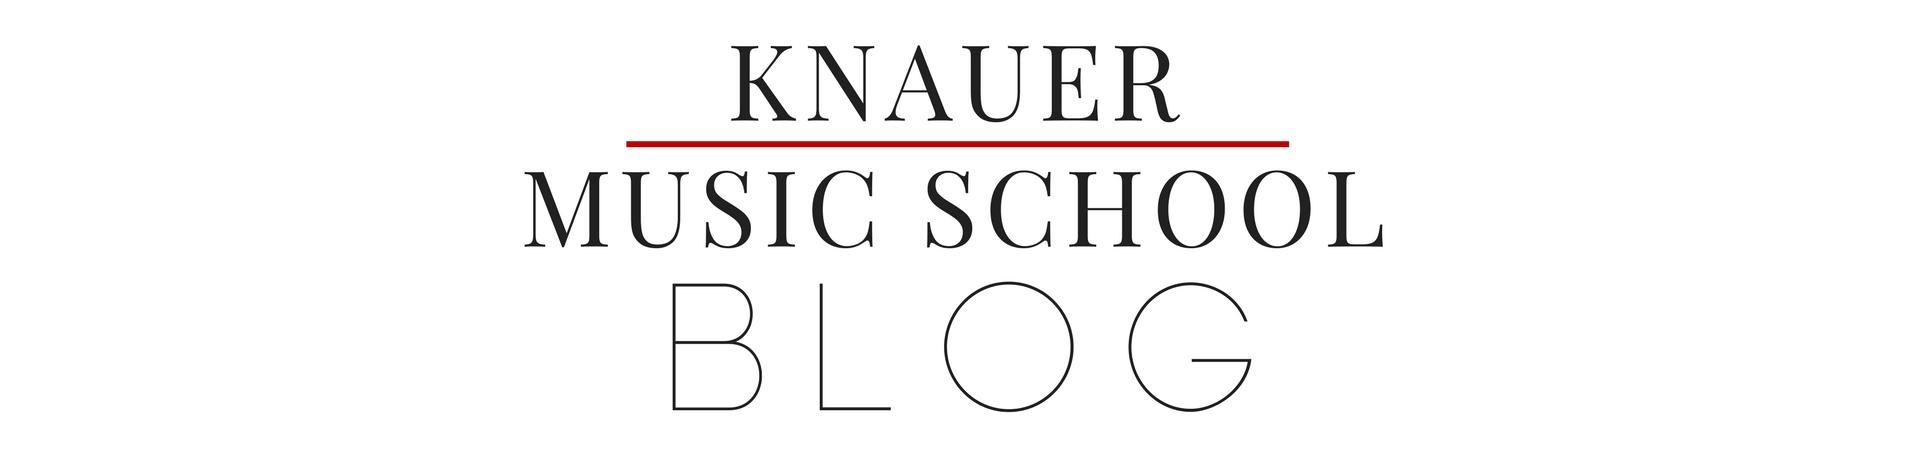 Knauer Music School